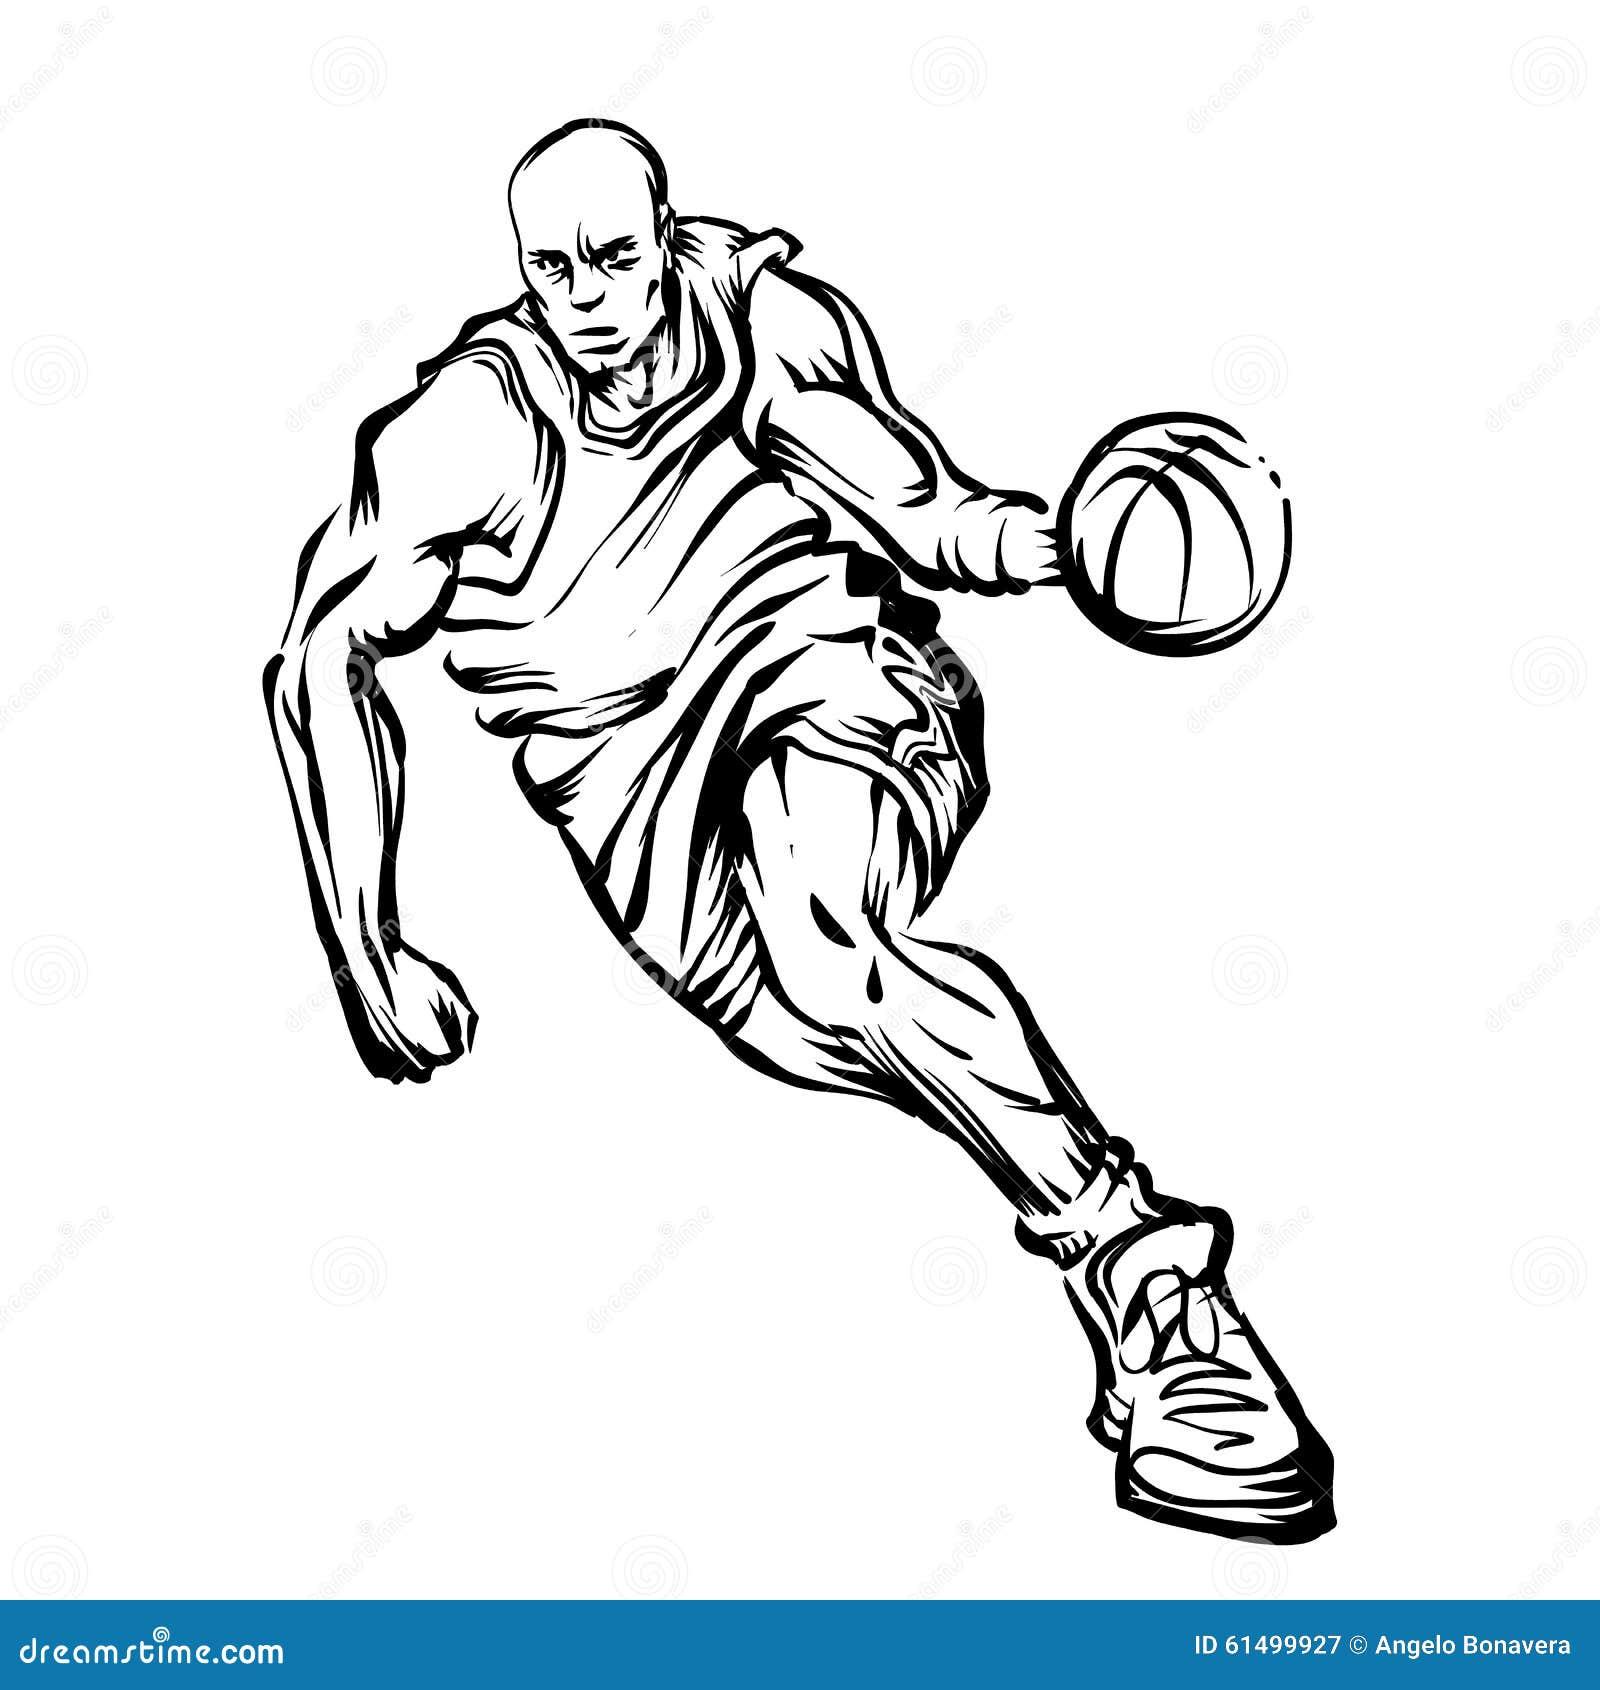 Basketball player stock illustration. Illustration of shoe